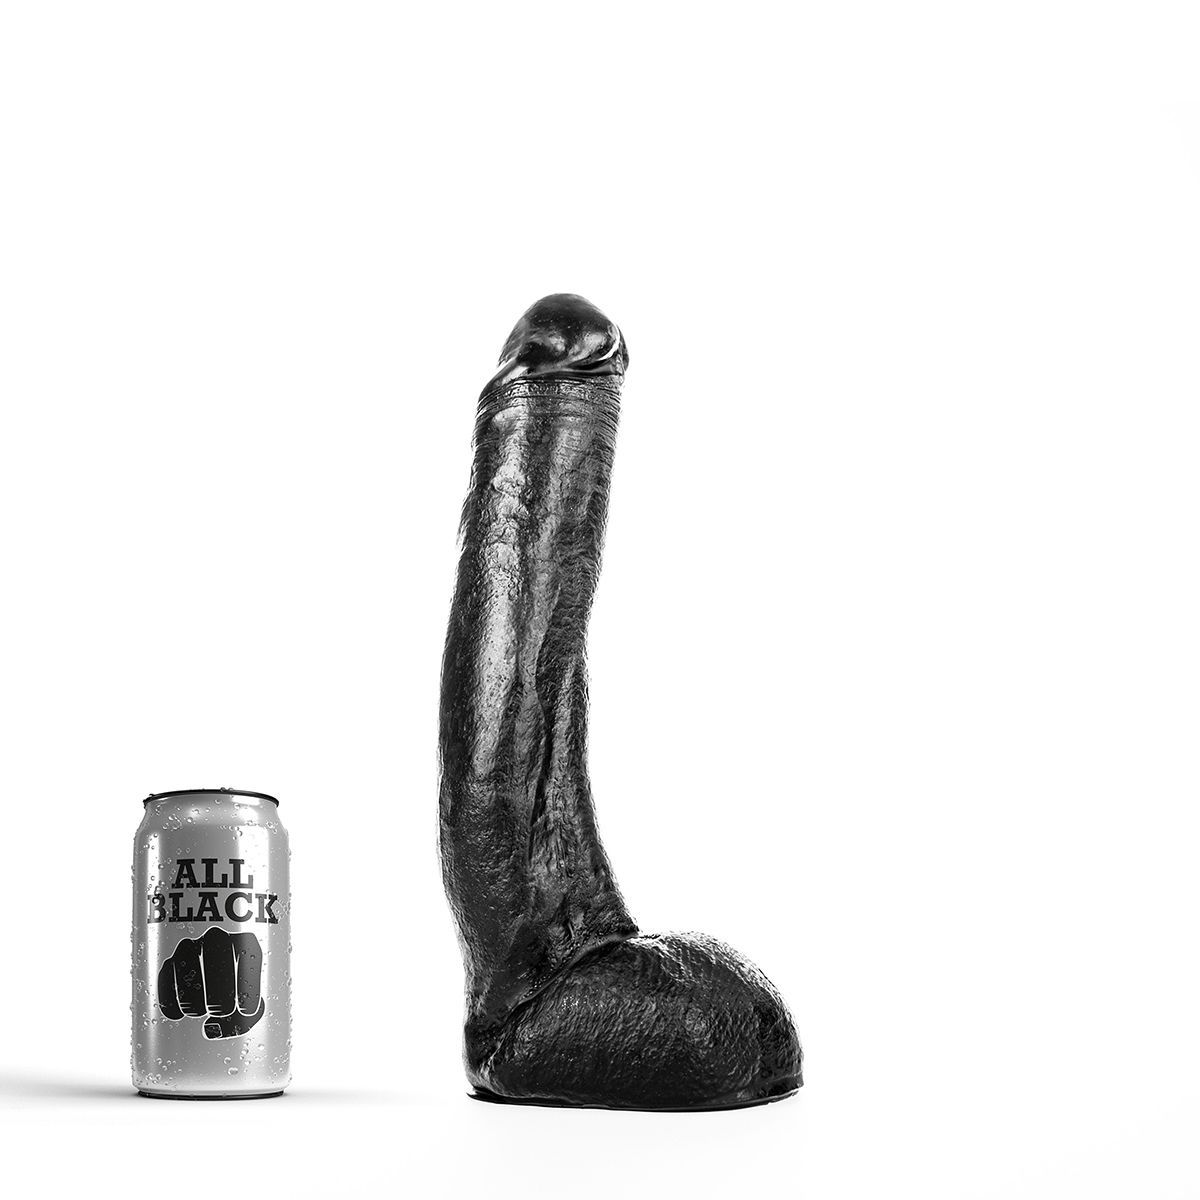 All Black 15 – Stor Dildo